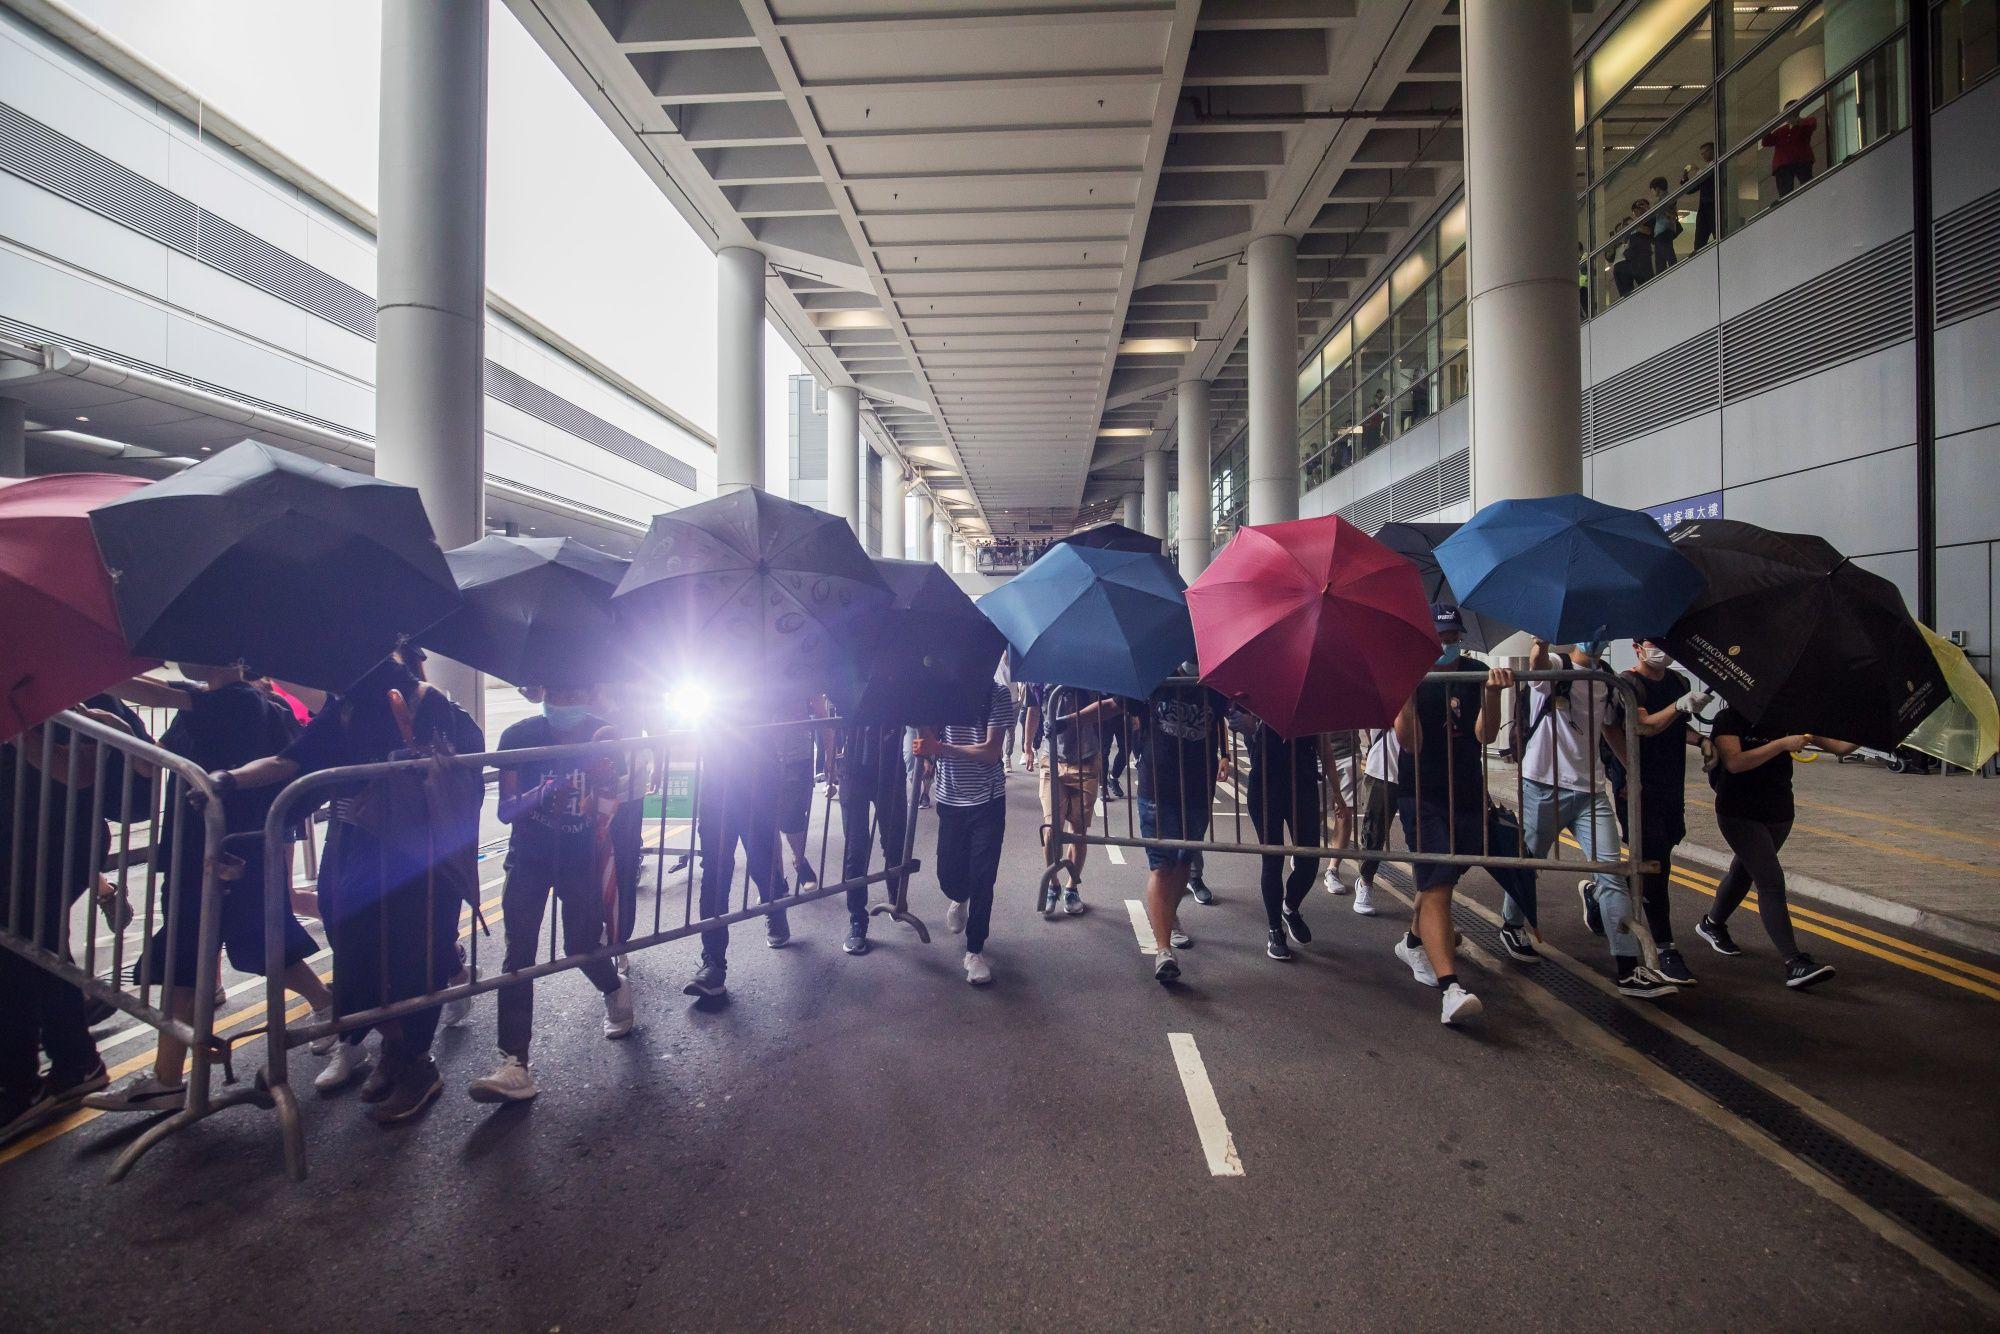 Taiwan Denies Stoking Hong Kong Unrest, Blames Communist Party